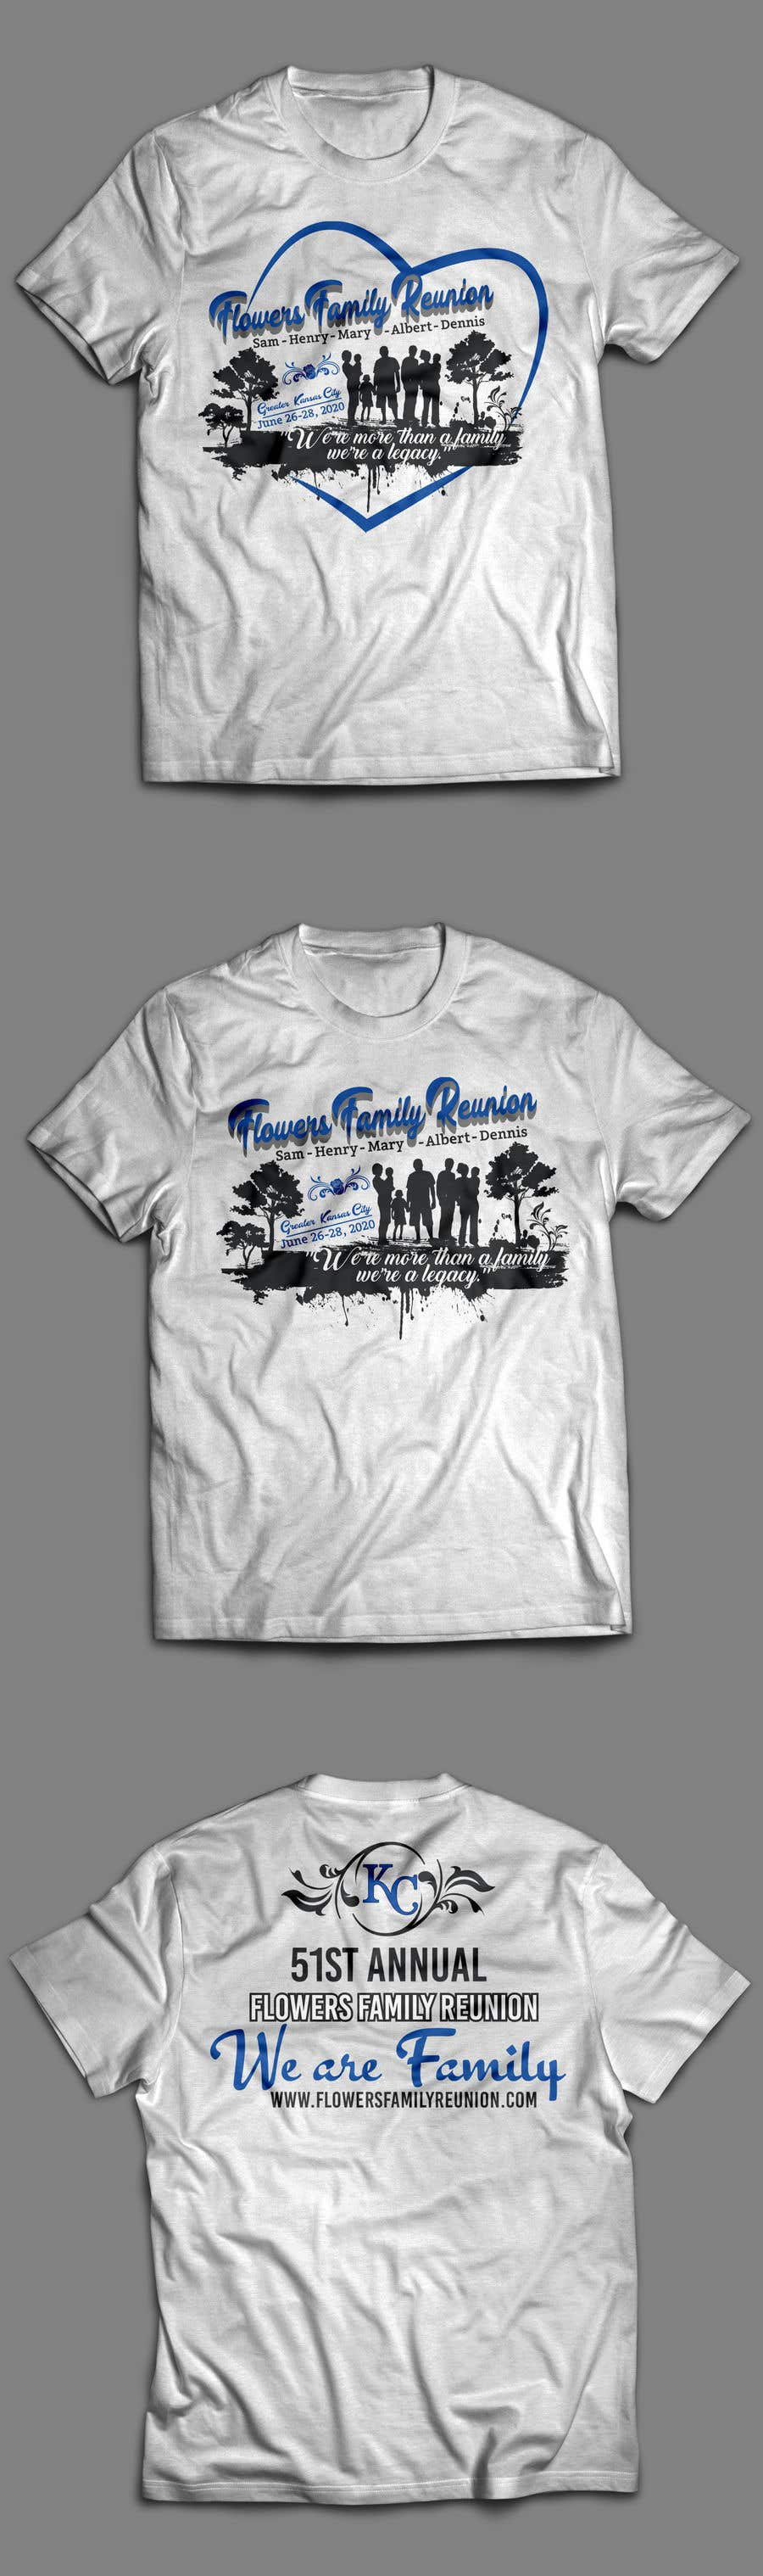 a882e1326 Contest Entry #33 for Graphic Design for Family Reunion T-Shirt and  Marketing Materials